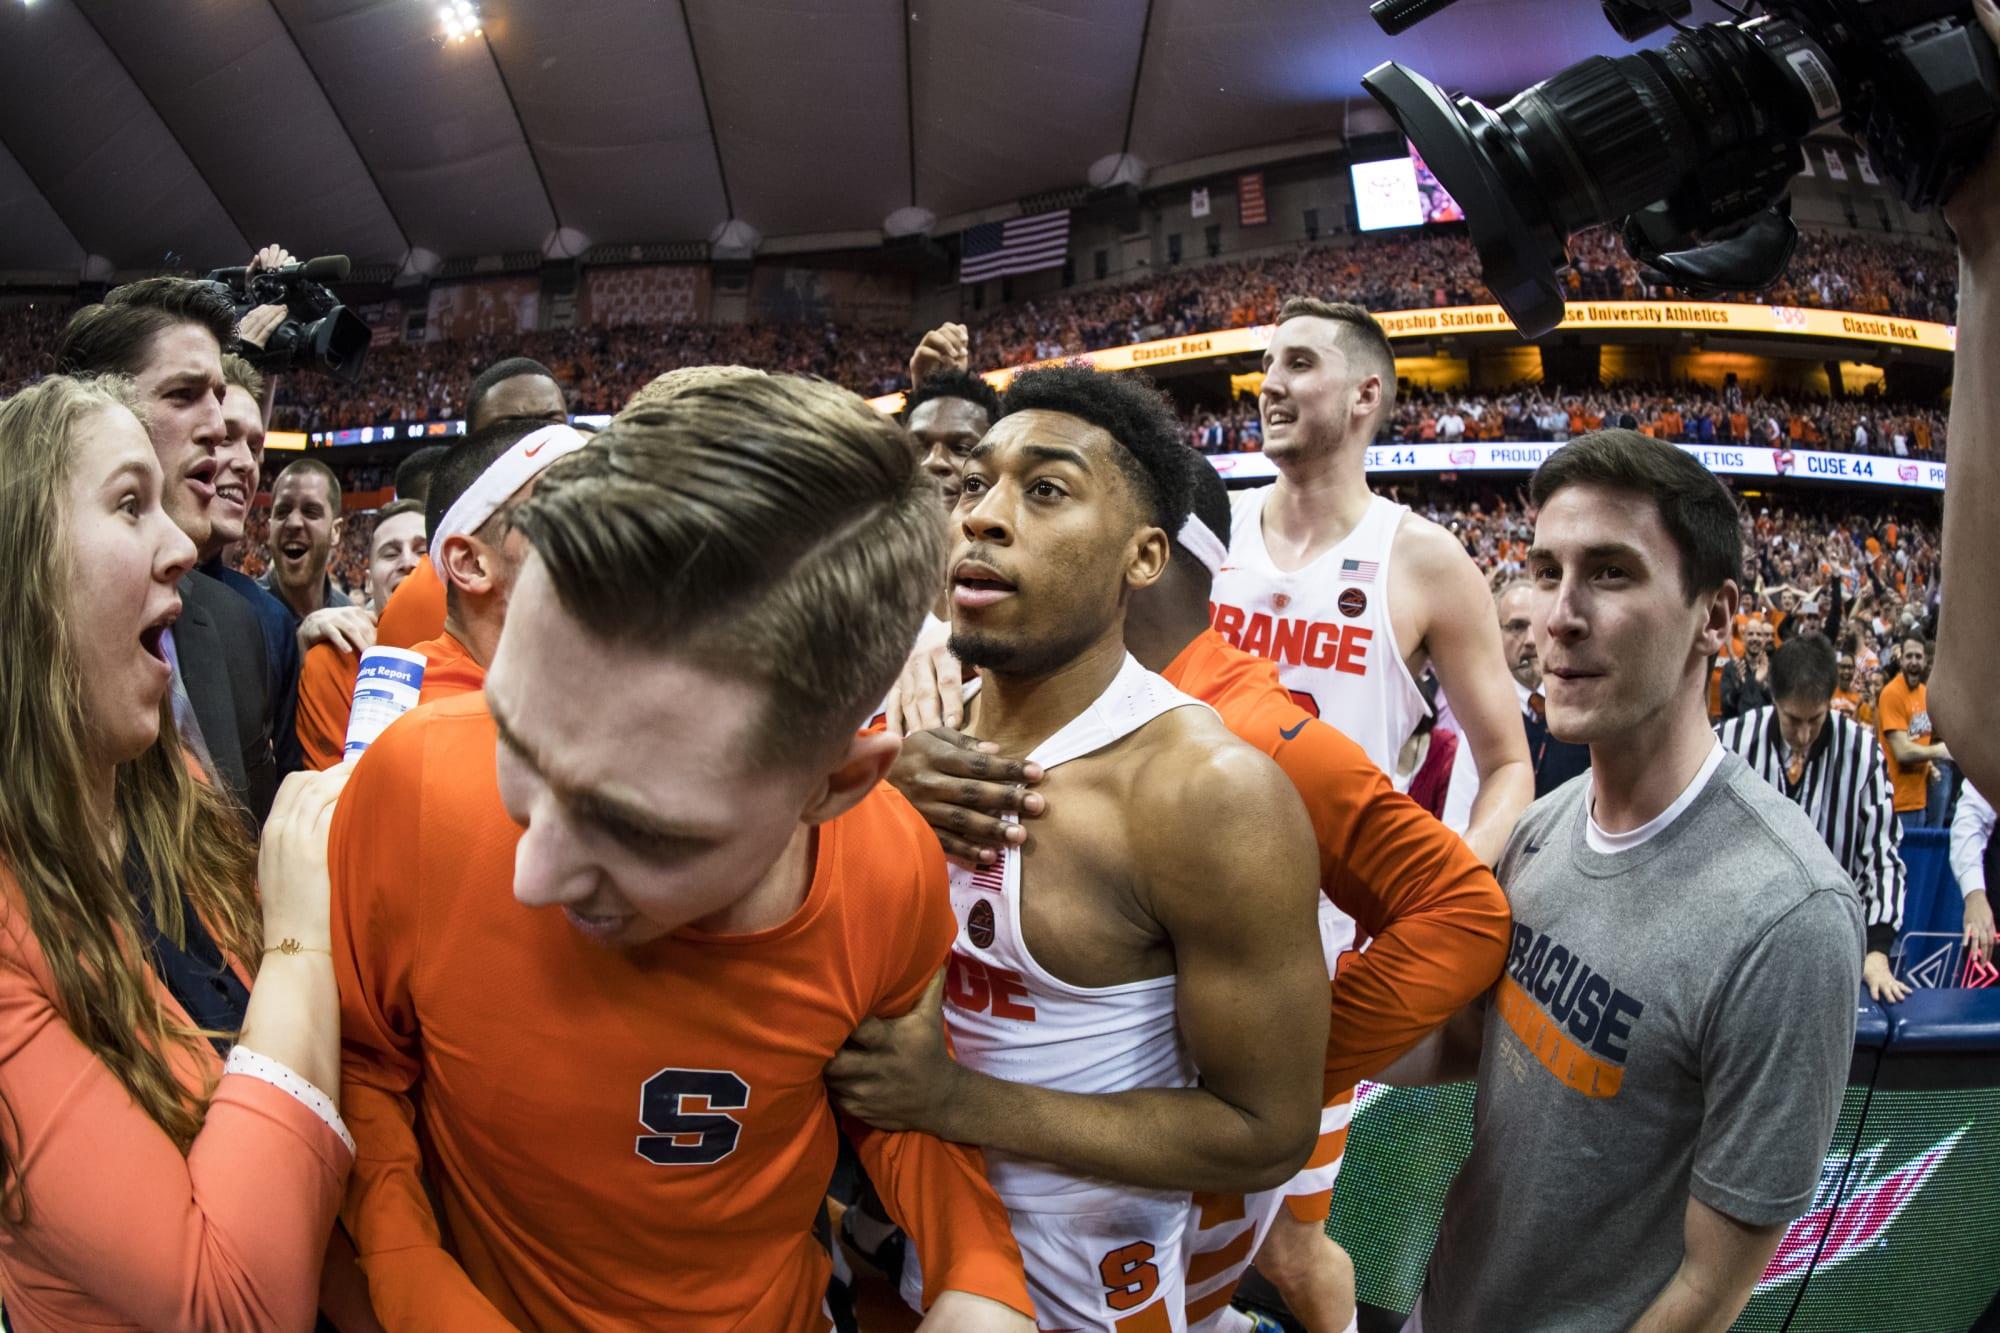 Syracuse Basketball: Boeheim's Army first TBT foe will prove formidable